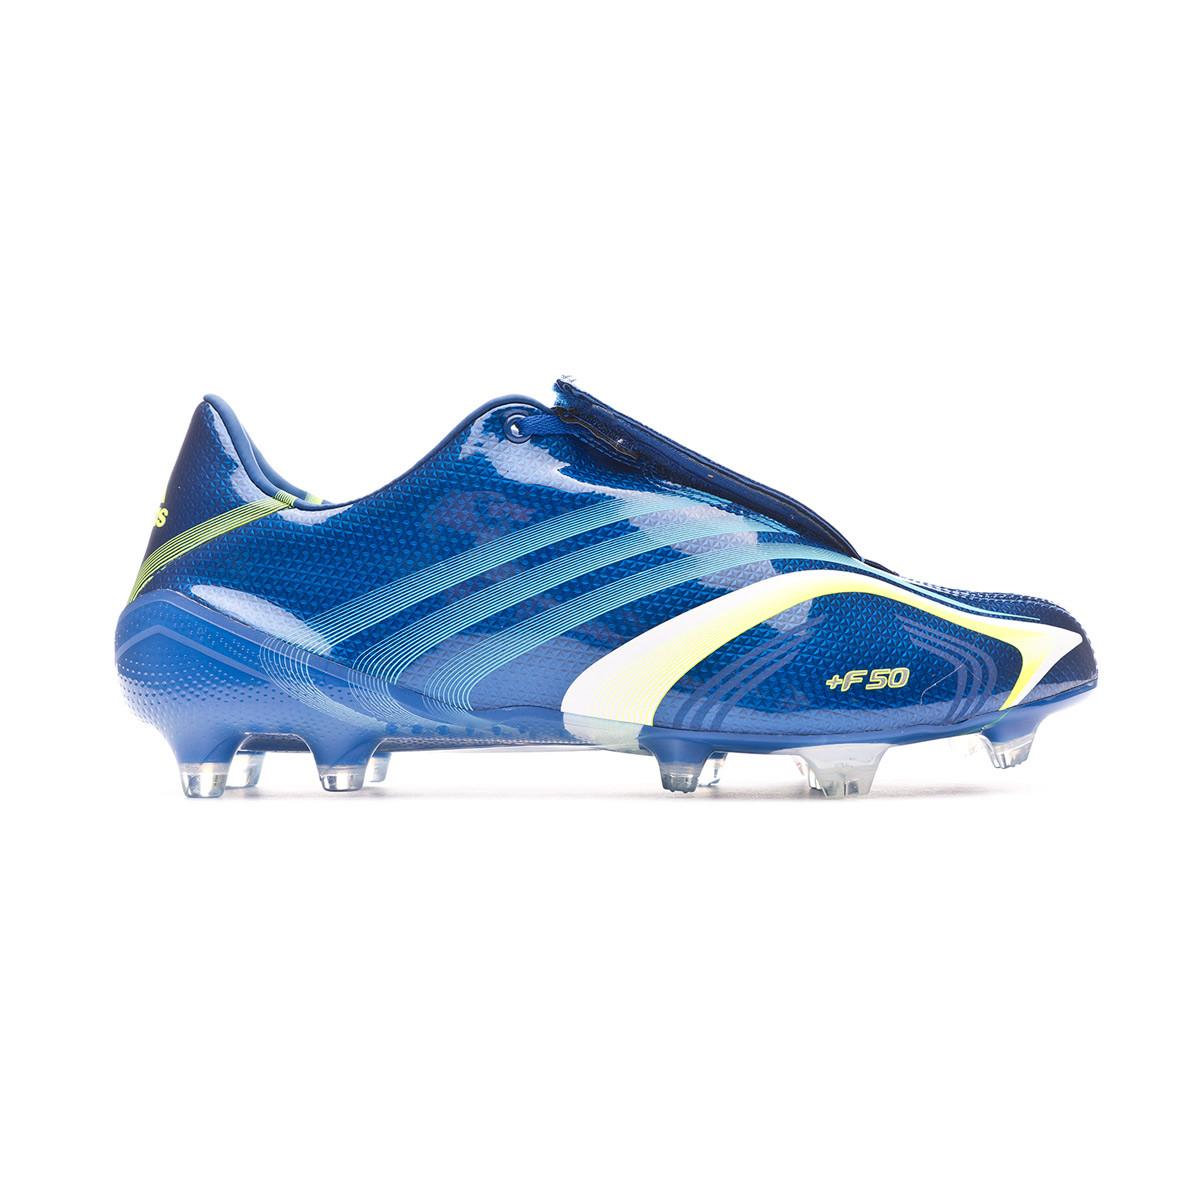 Influencia Separar Cartero  Football Boots adidas X 506+ F50 Tunit Remake Blue - Football store Fútbol  Emotion